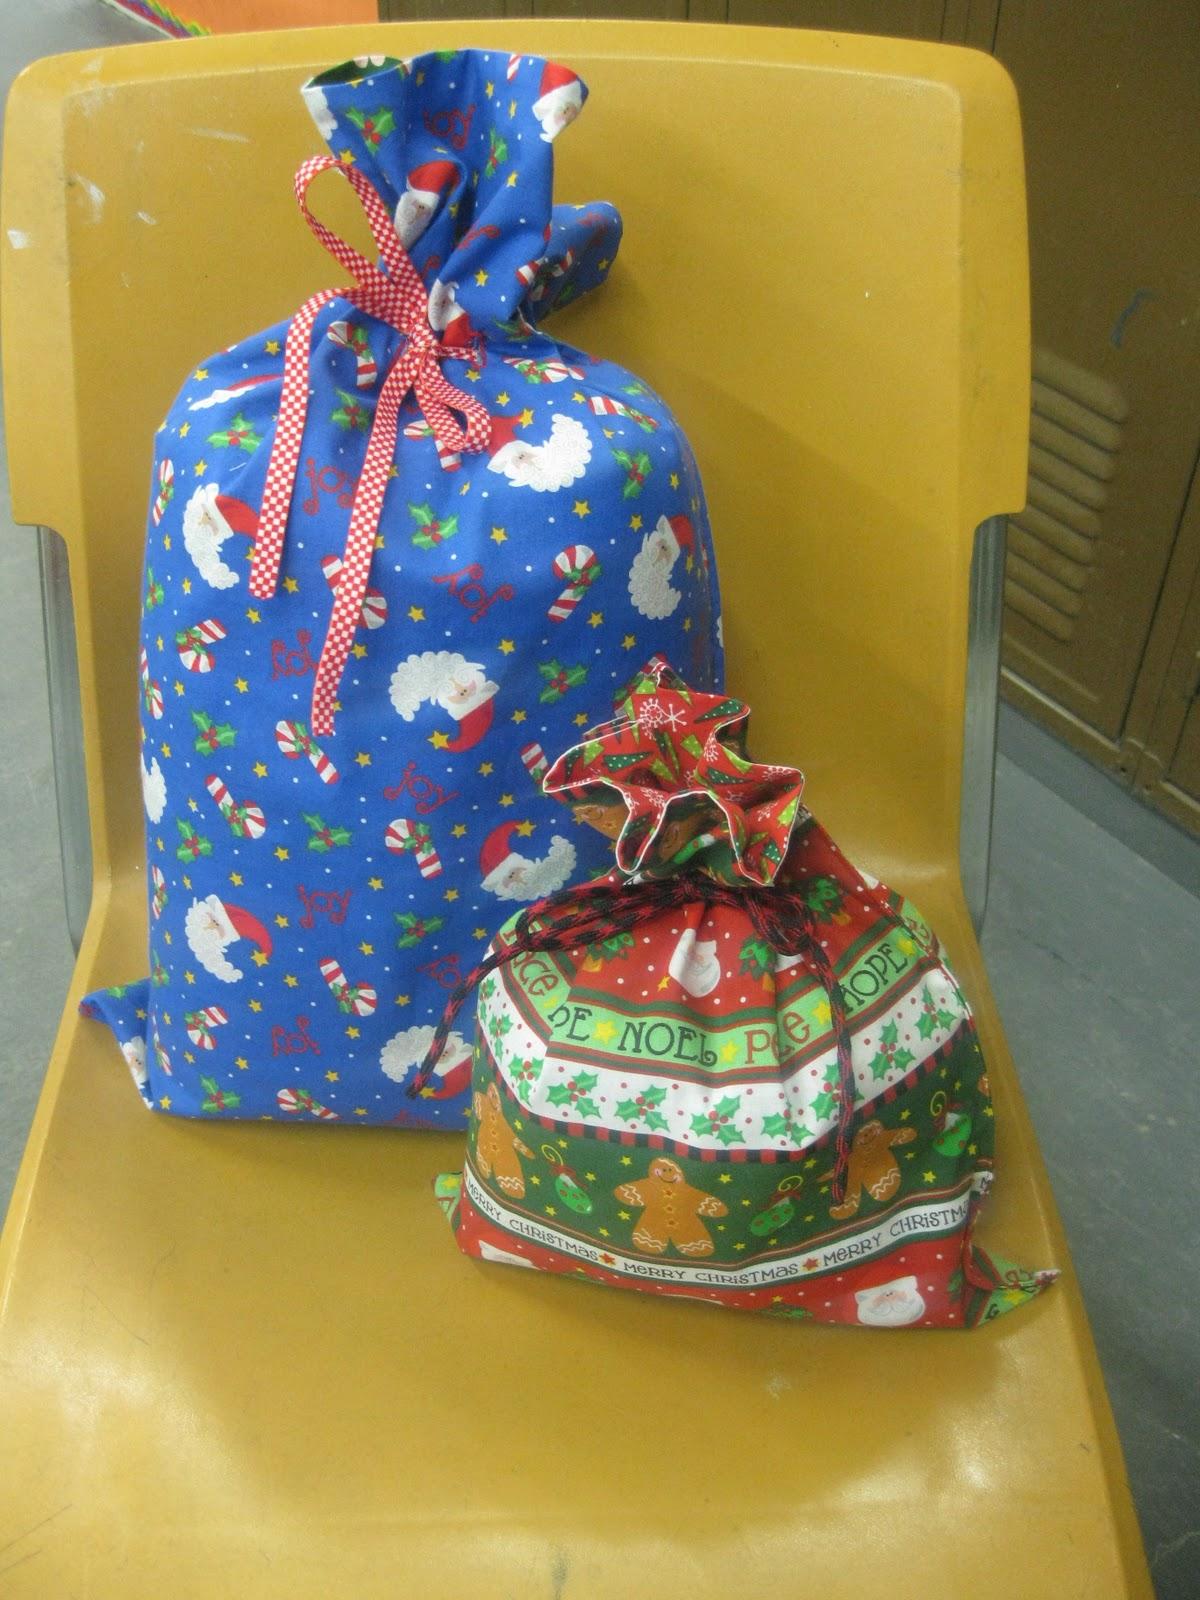 Sewing Steph Reversible Reusable Gift Bag Tutorial